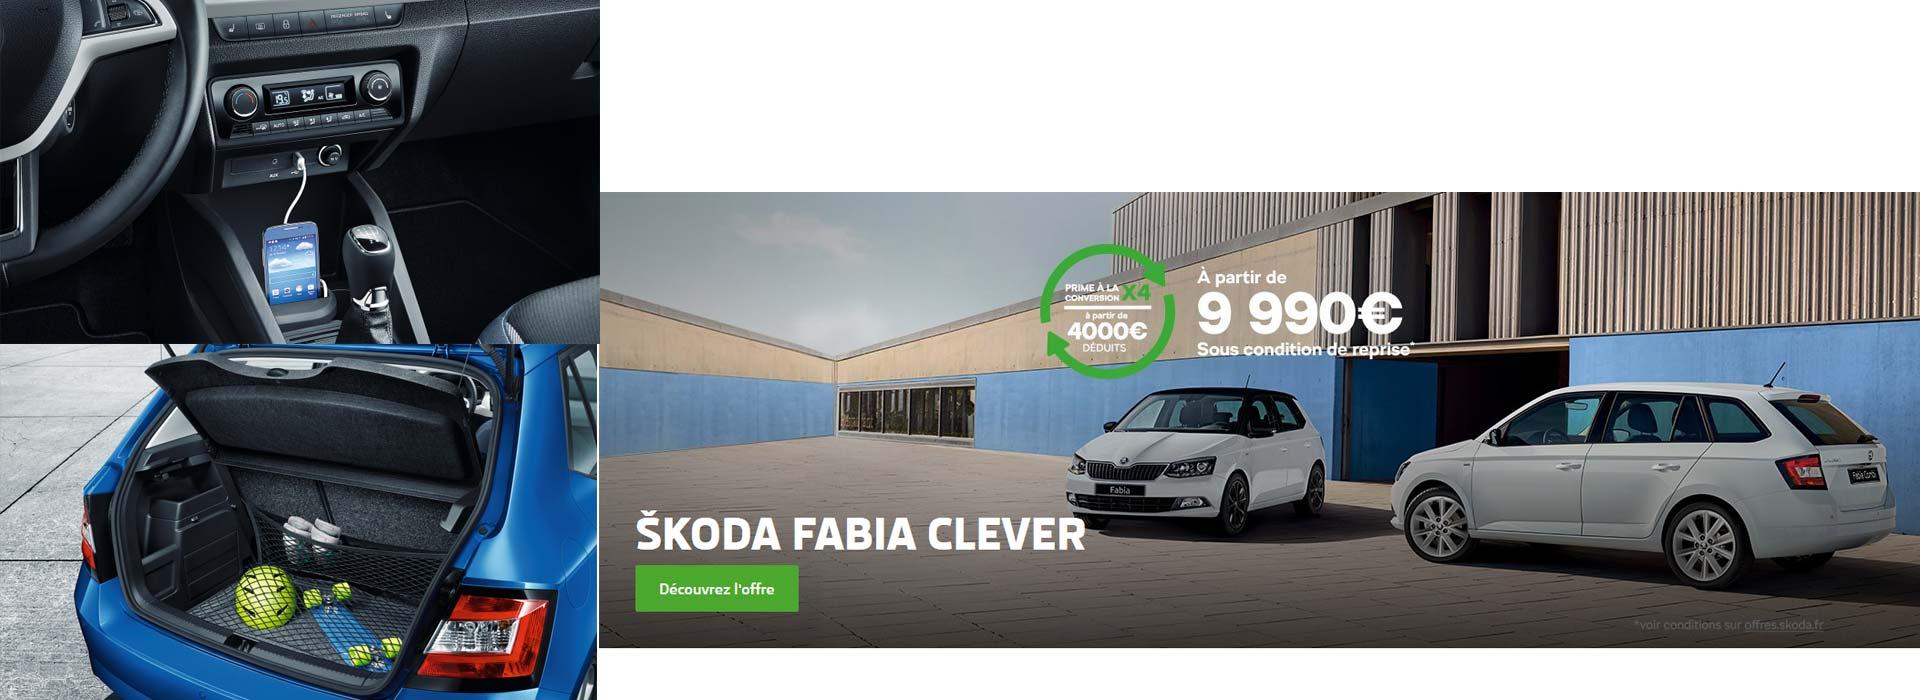 skoda chartres votre concessionnaire voitures neuves et. Black Bedroom Furniture Sets. Home Design Ideas